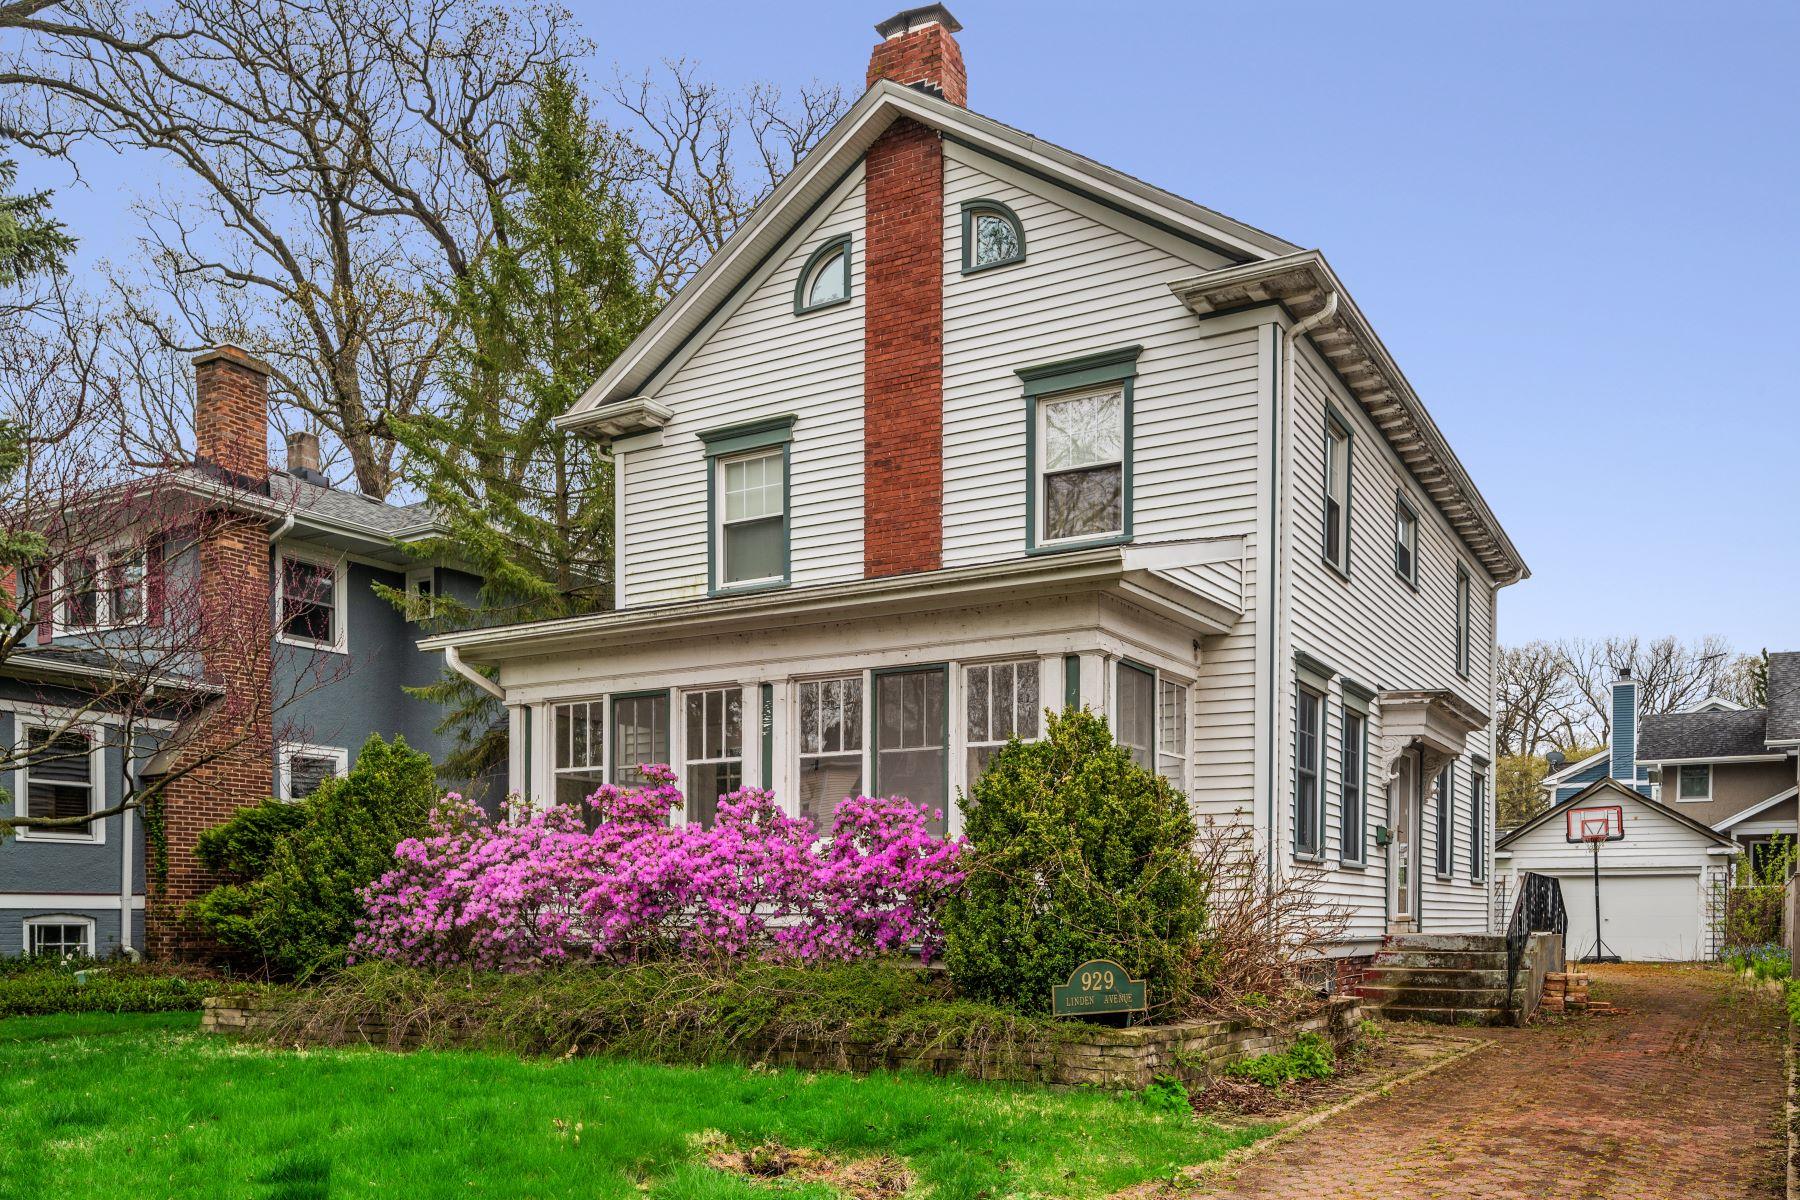 Single Family Homes para Venda às Great Home 929 Linden Avenue, Wilmette, Illinois 60091 Estados Unidos